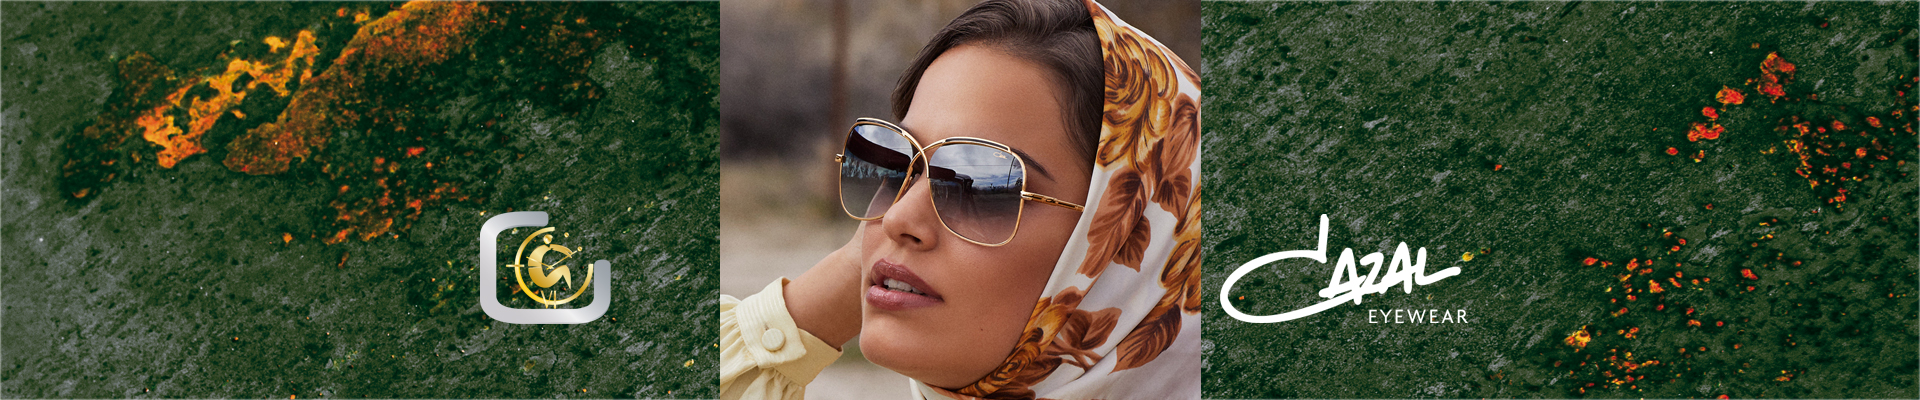 hier gehts zu den Cazal Sonnenbrillen